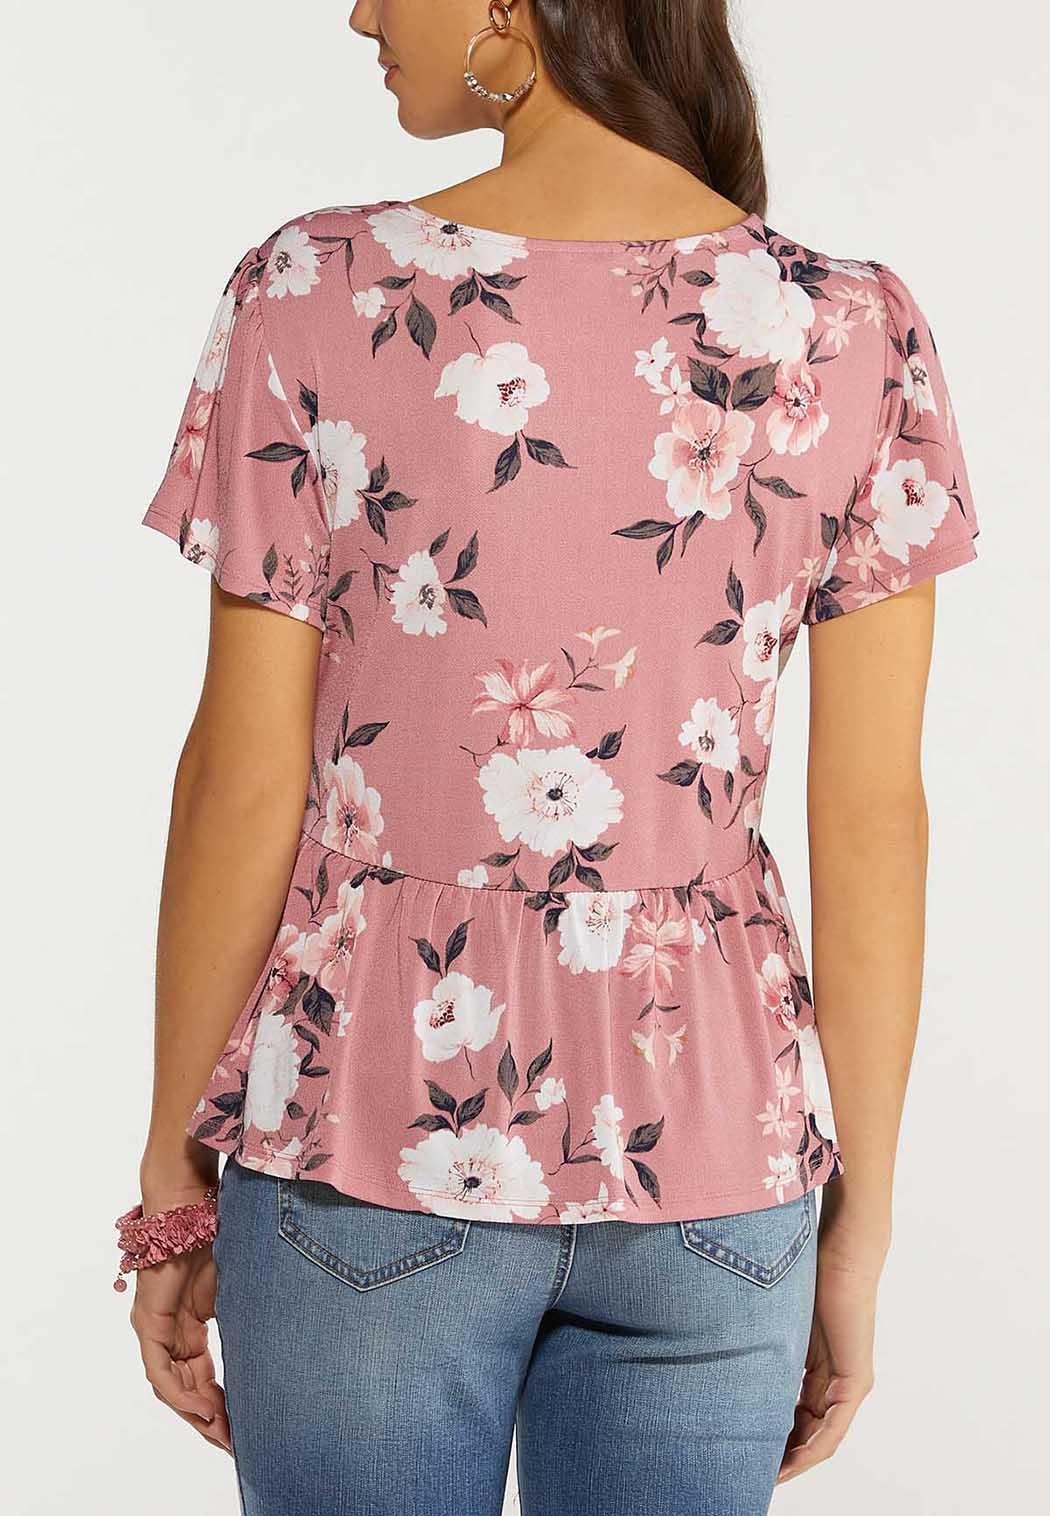 Blossom Peplum Top (Item #44495469)